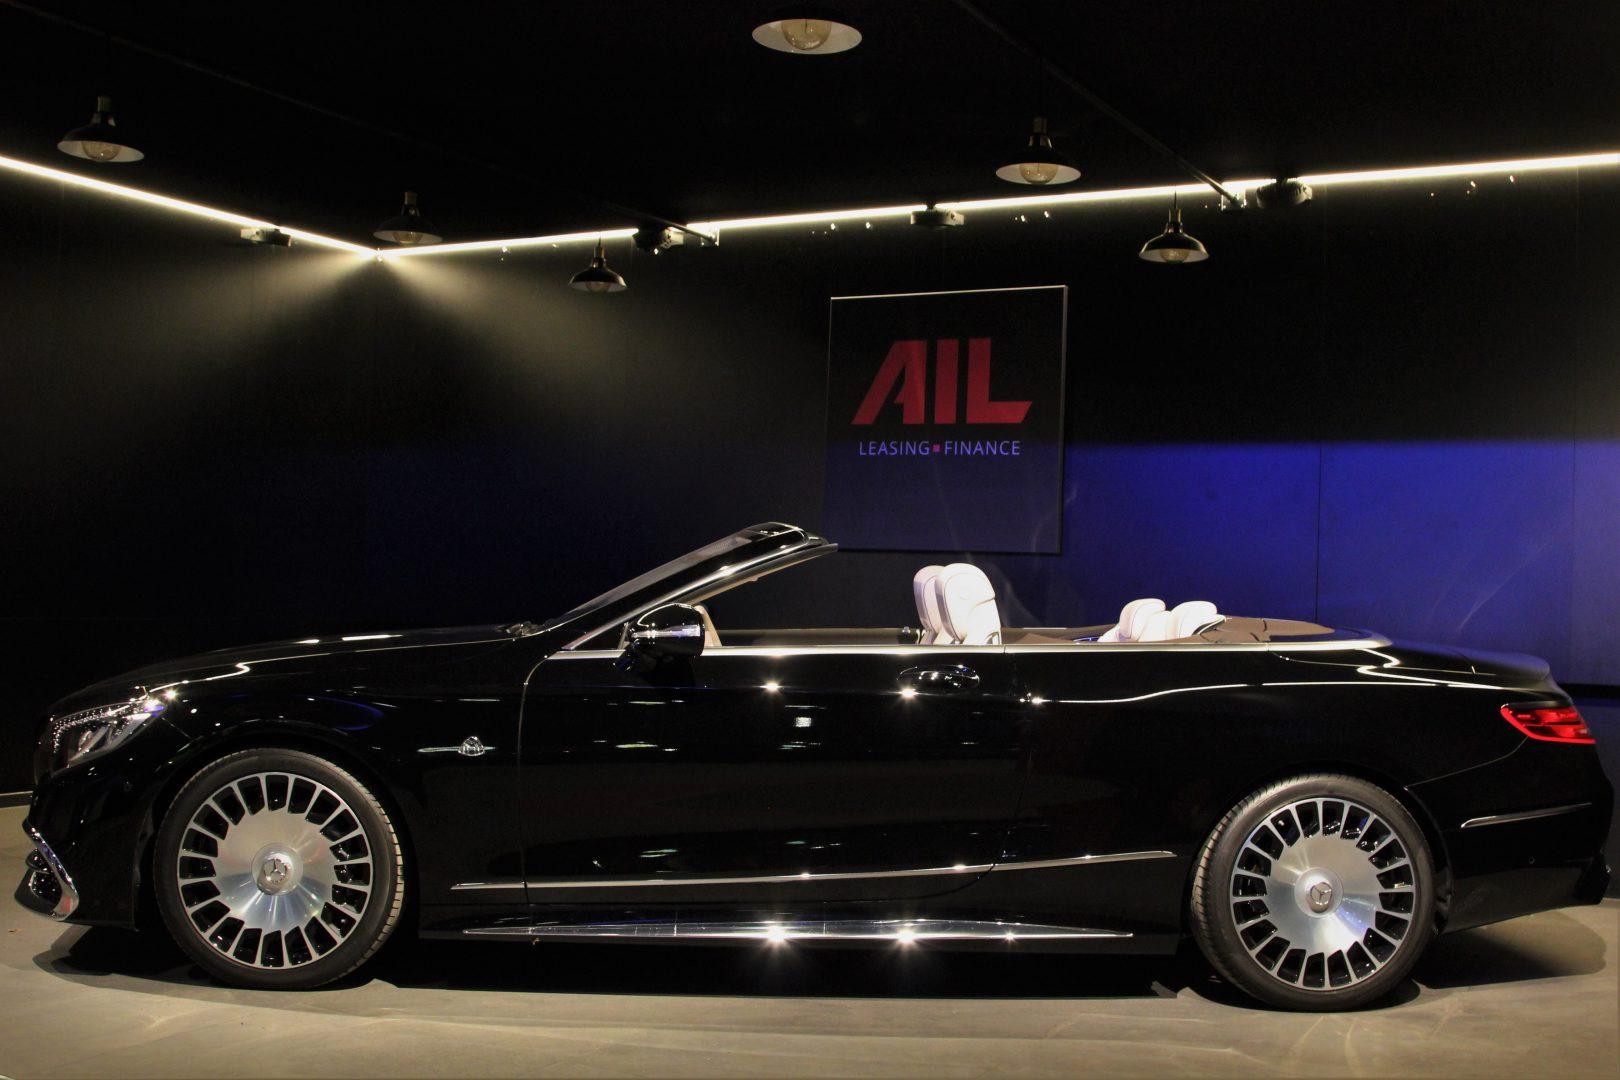 AIL Mercedes-Benz S650 MAYBACH V12 Exklusiv-Paket 4